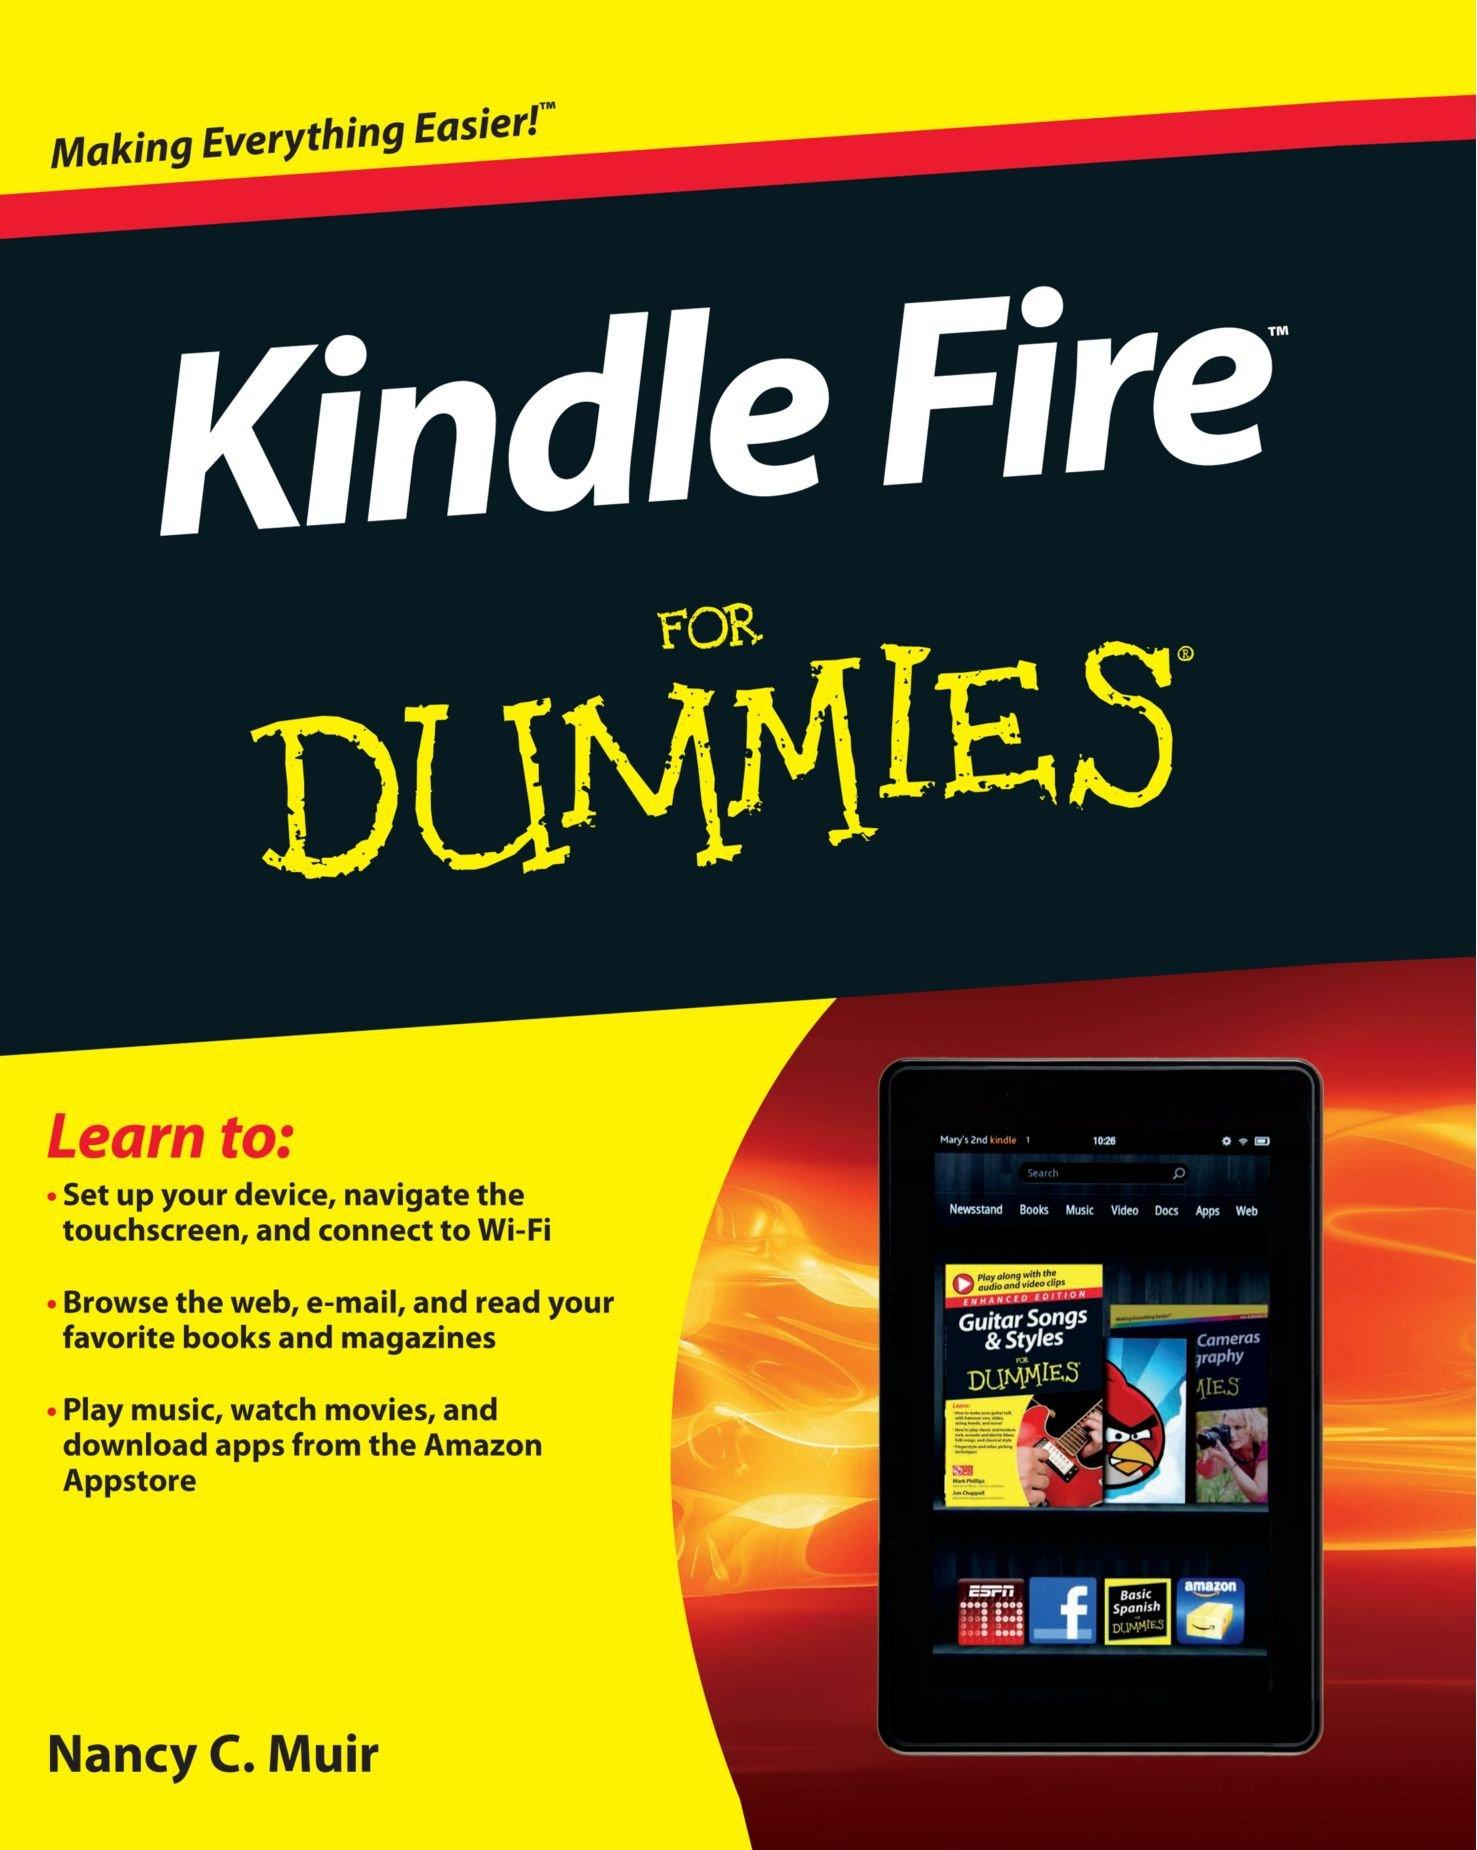 Ebook-0526] dummies books list free download user manual | 2019.